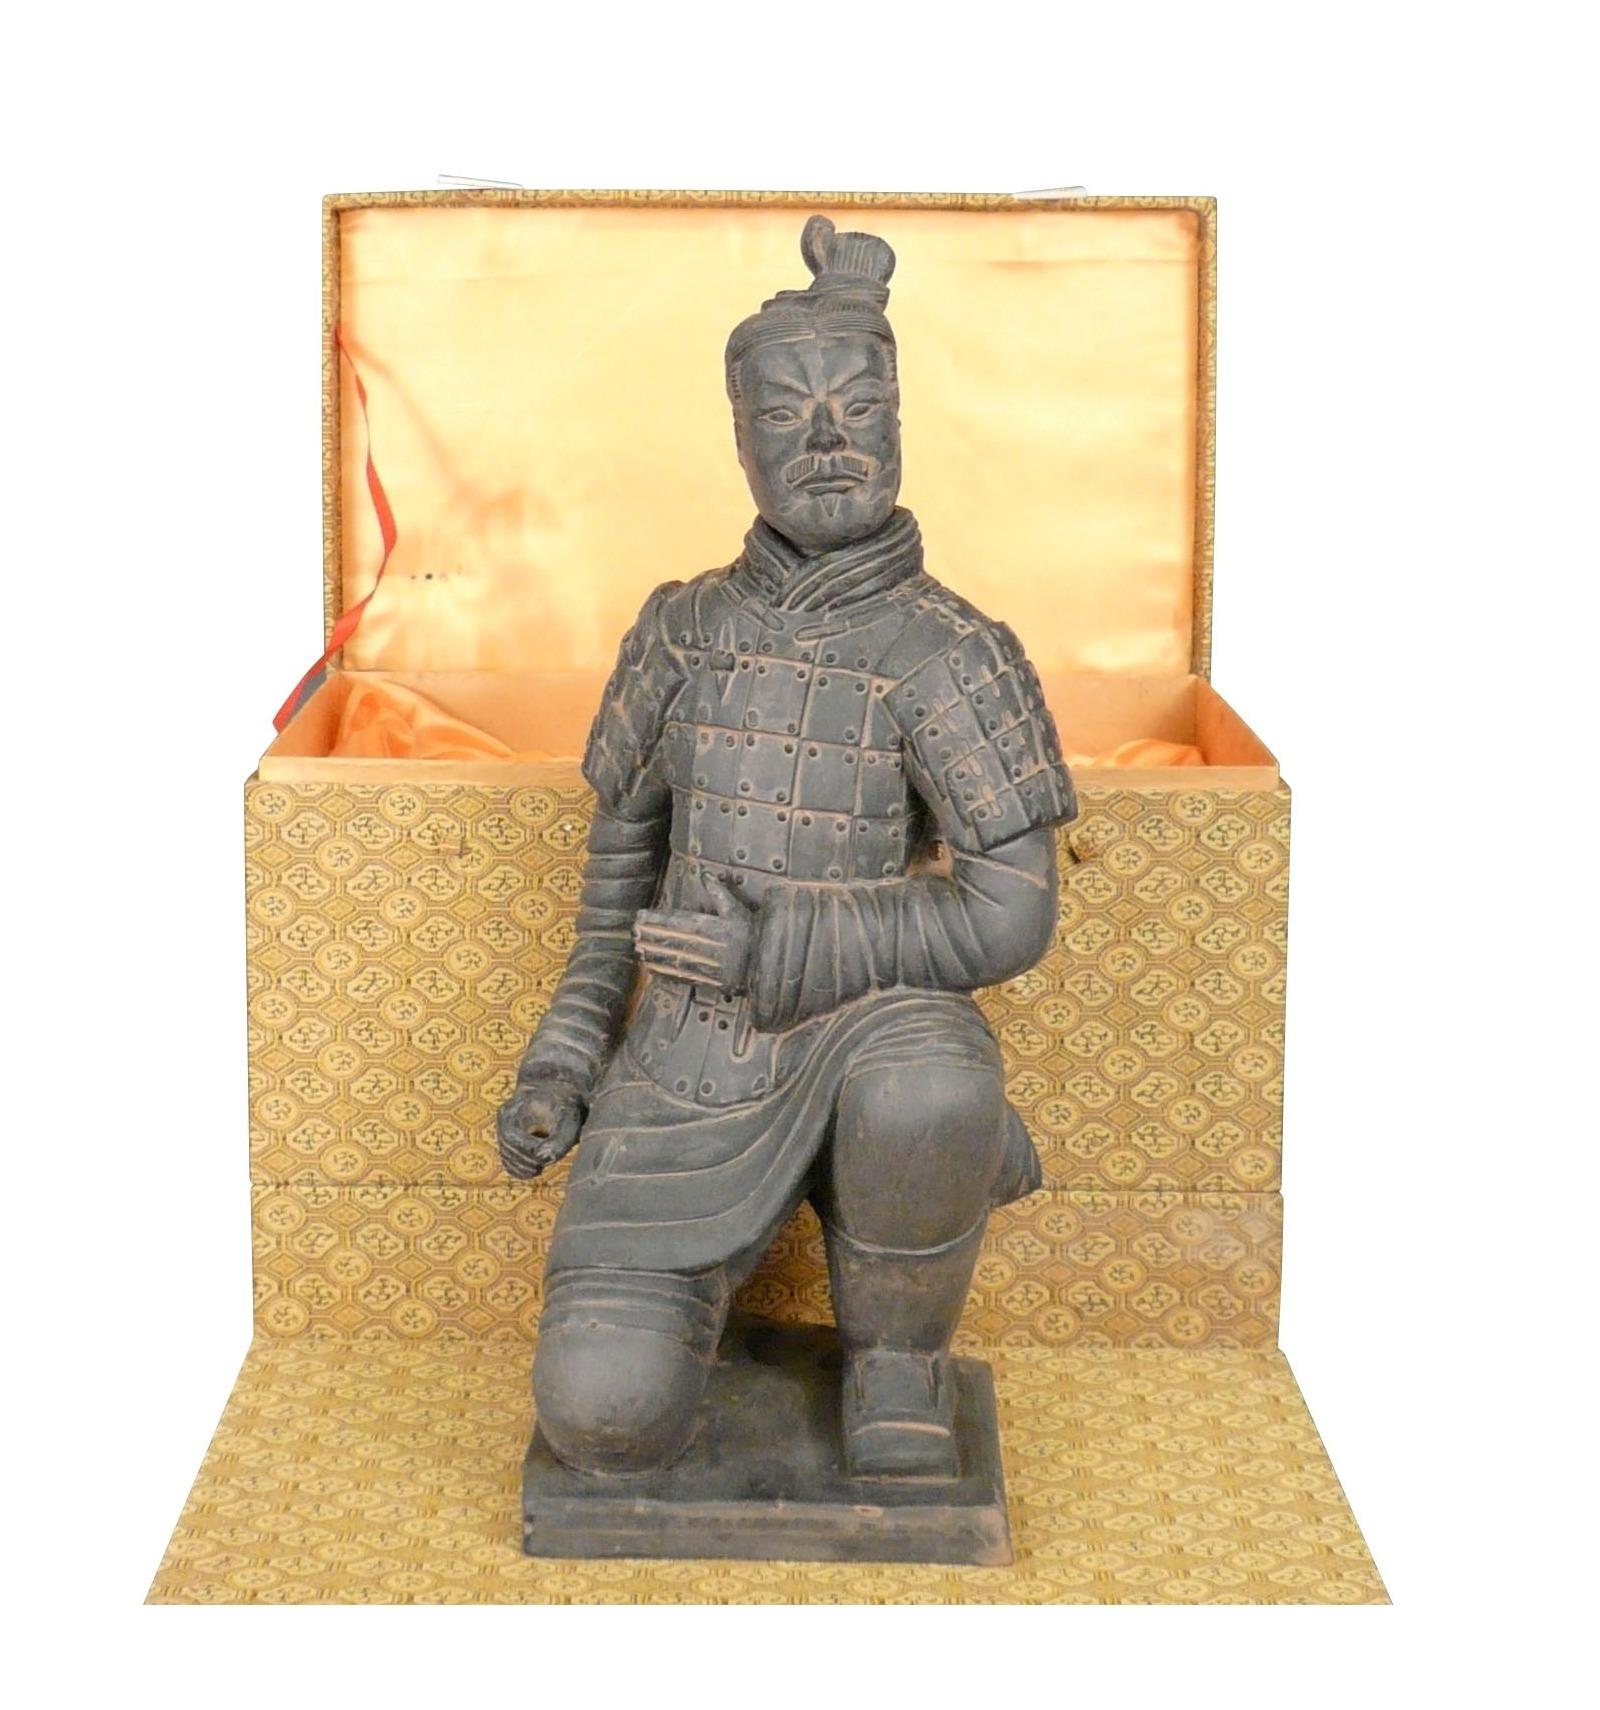 Archer Soldier Statuette Chinese Xian Terracotta Warrior Statues Xian